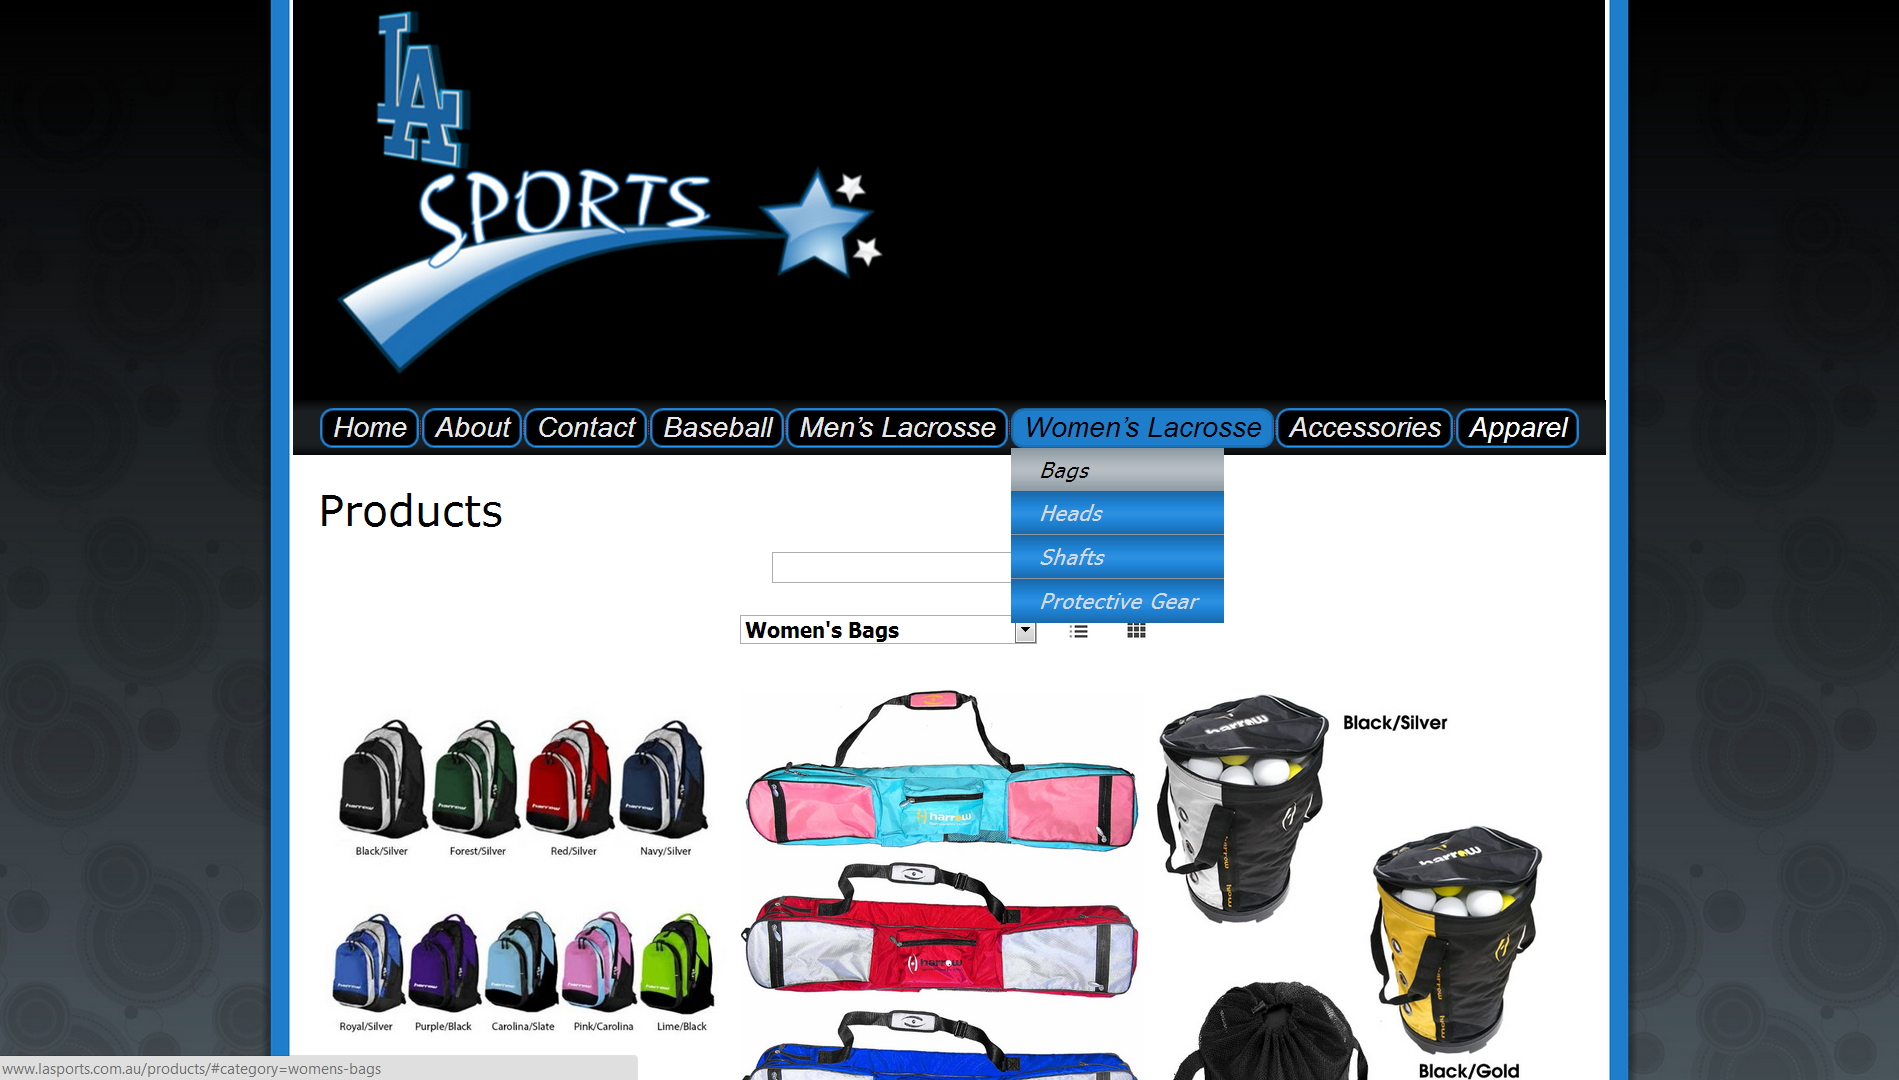 Online Shop Website for La Sports